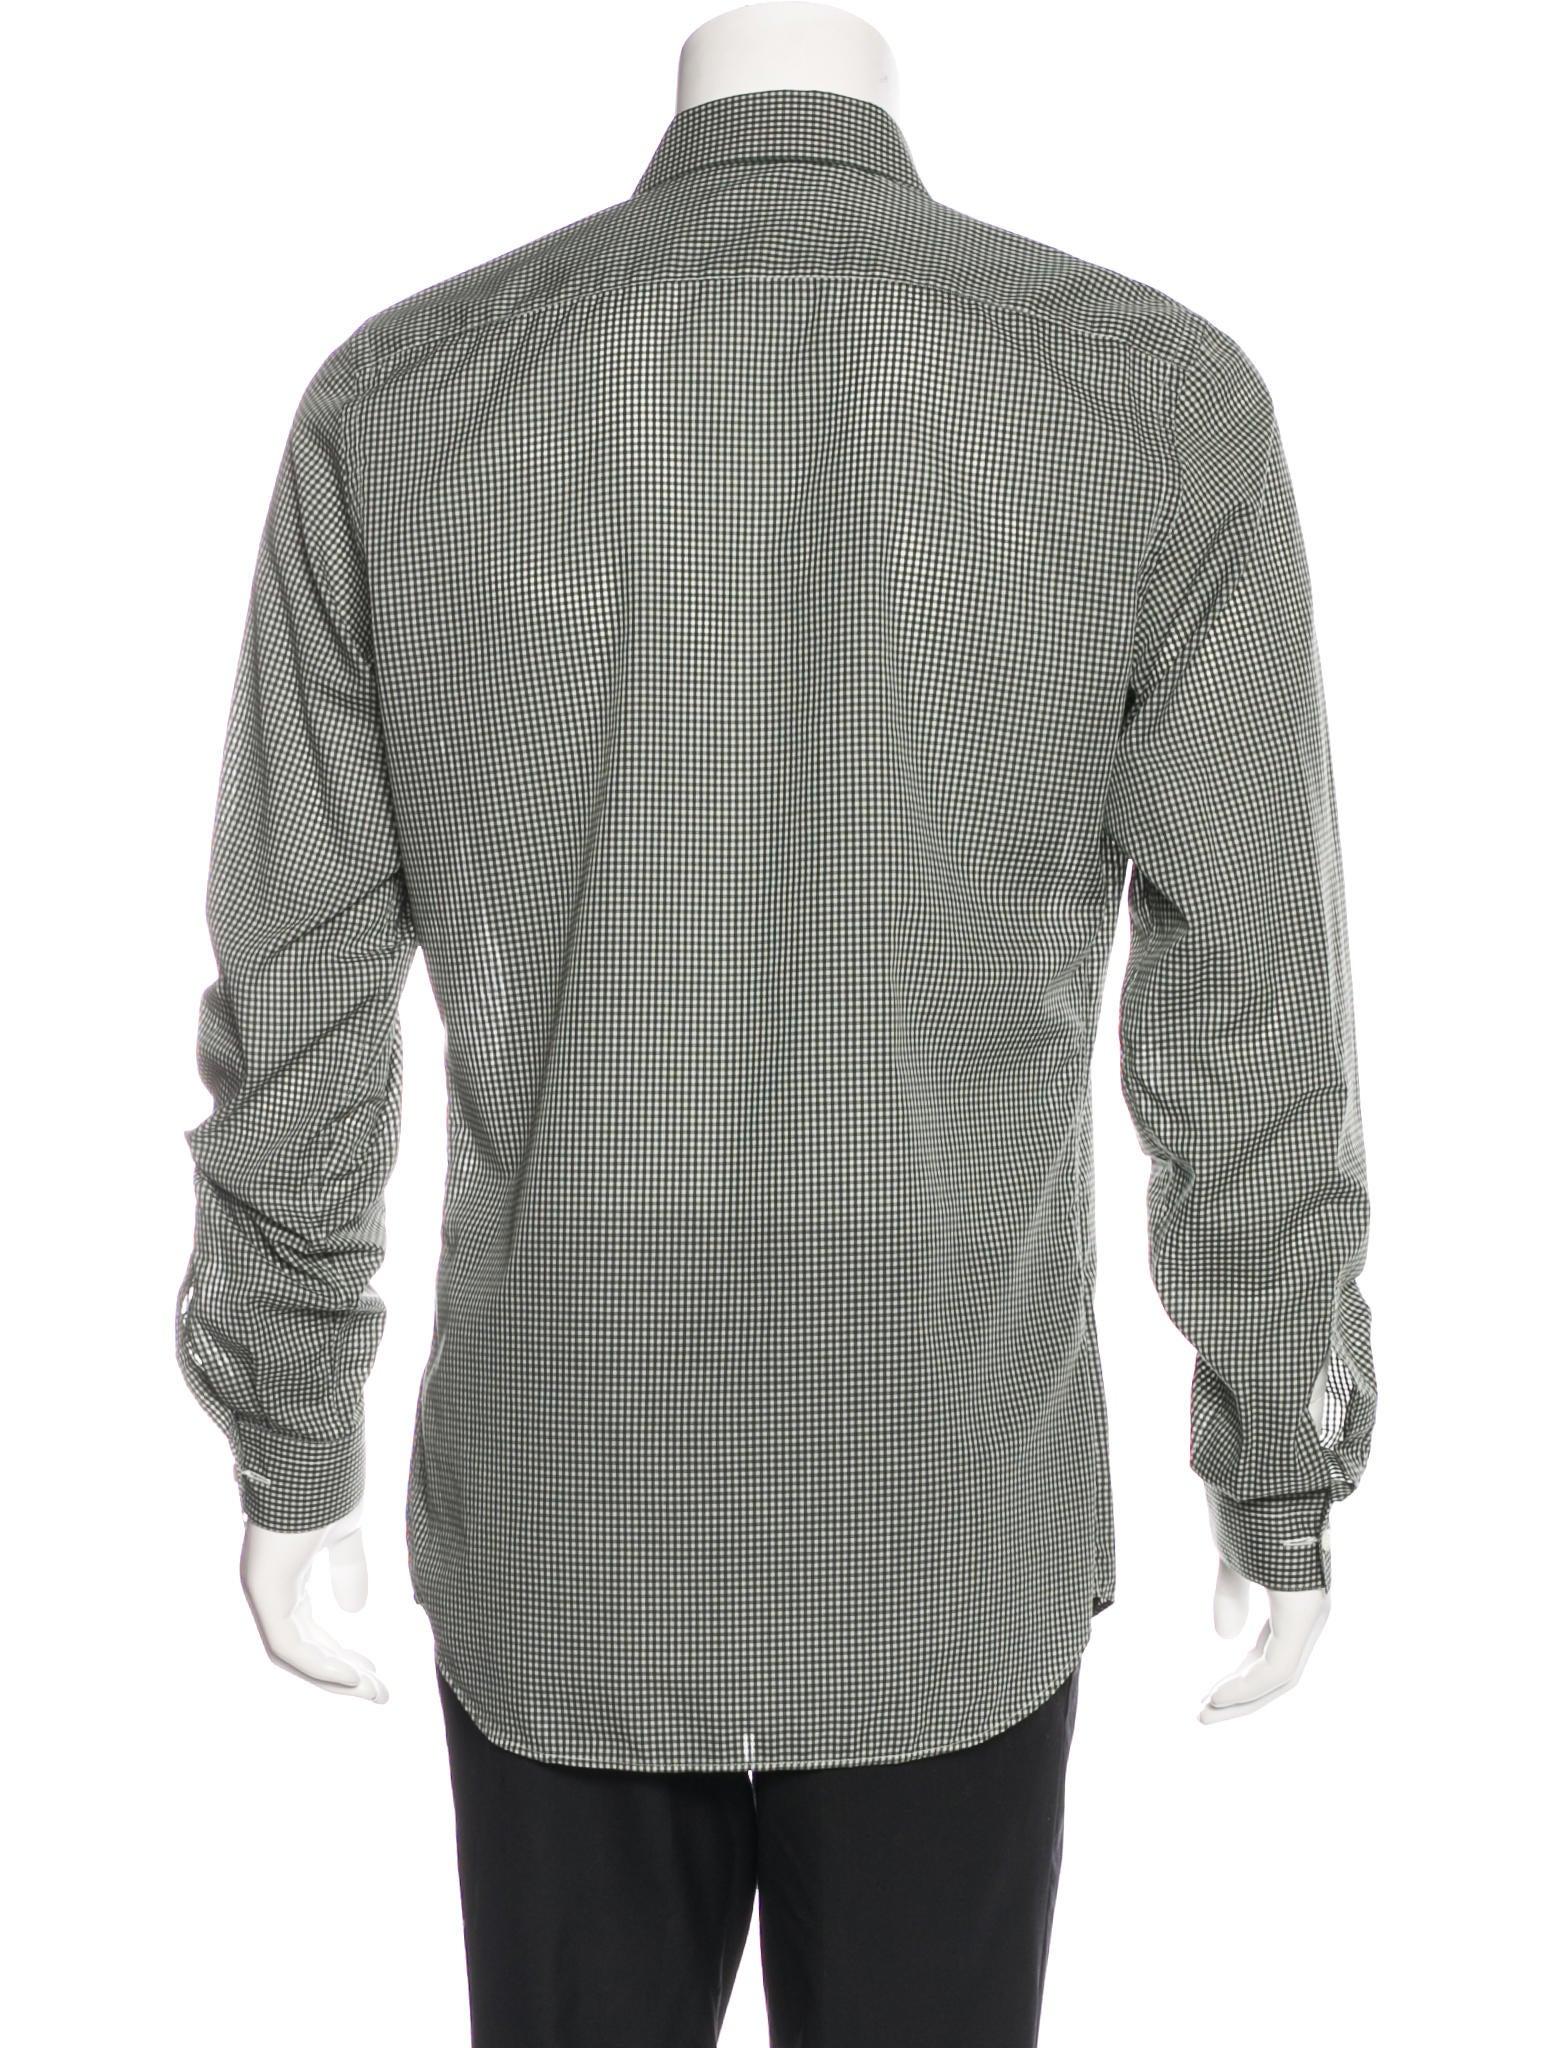 Prada gingham dress shirt clothing pra133464 the for Gingham dress shirt men